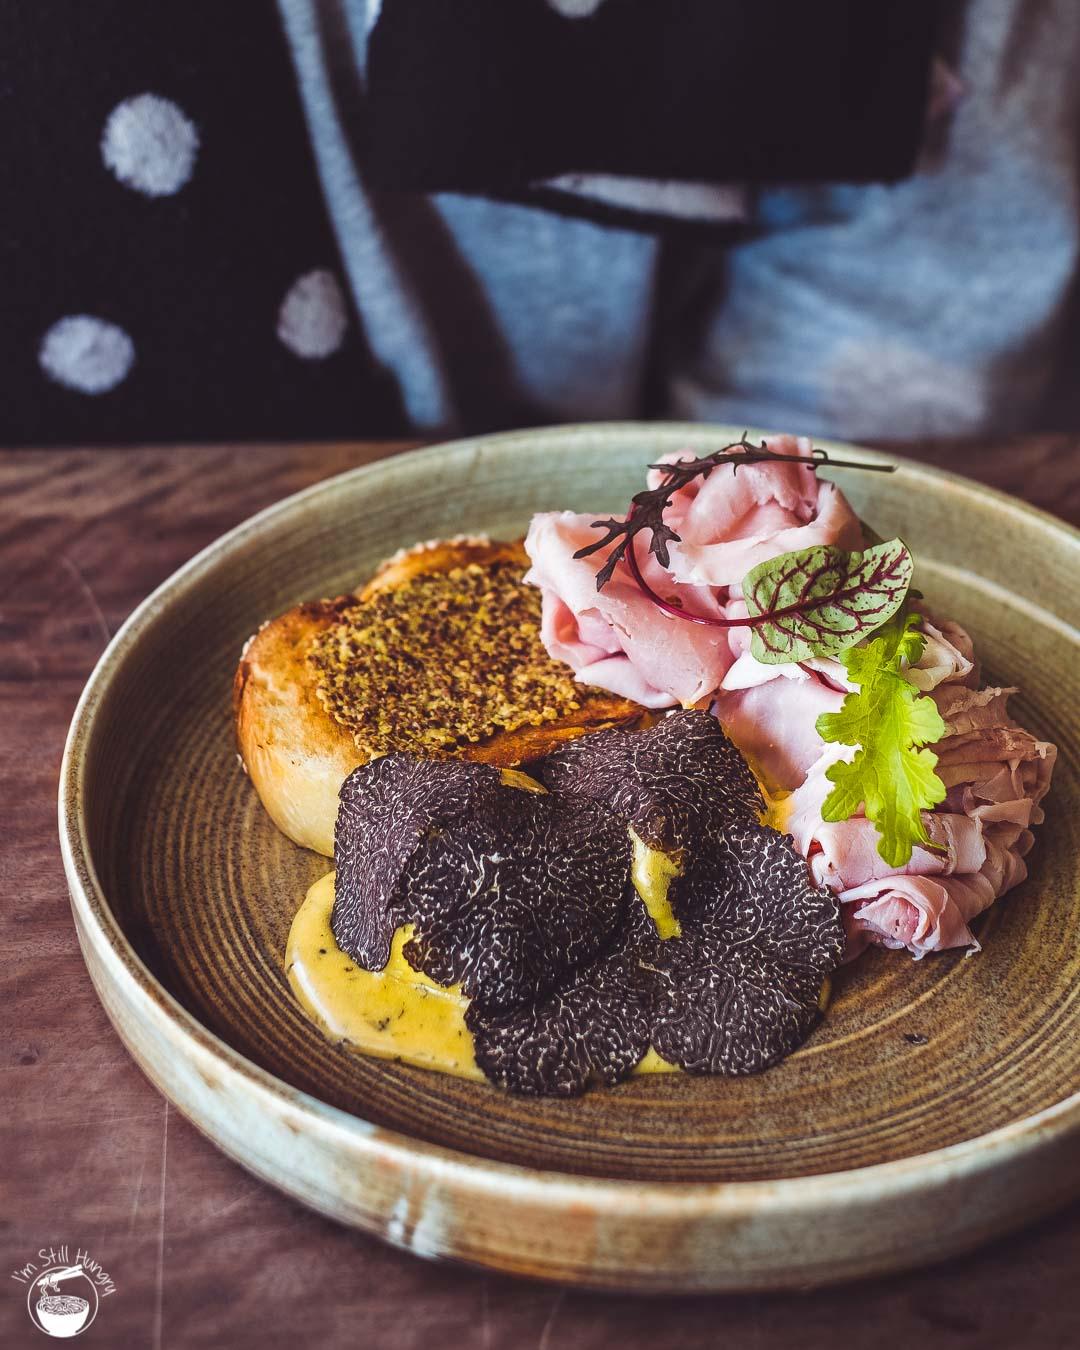 Cavalier Specialty Coffee Truffle gooey eggs, mustard & special hollandaise on challah toast w/truffle